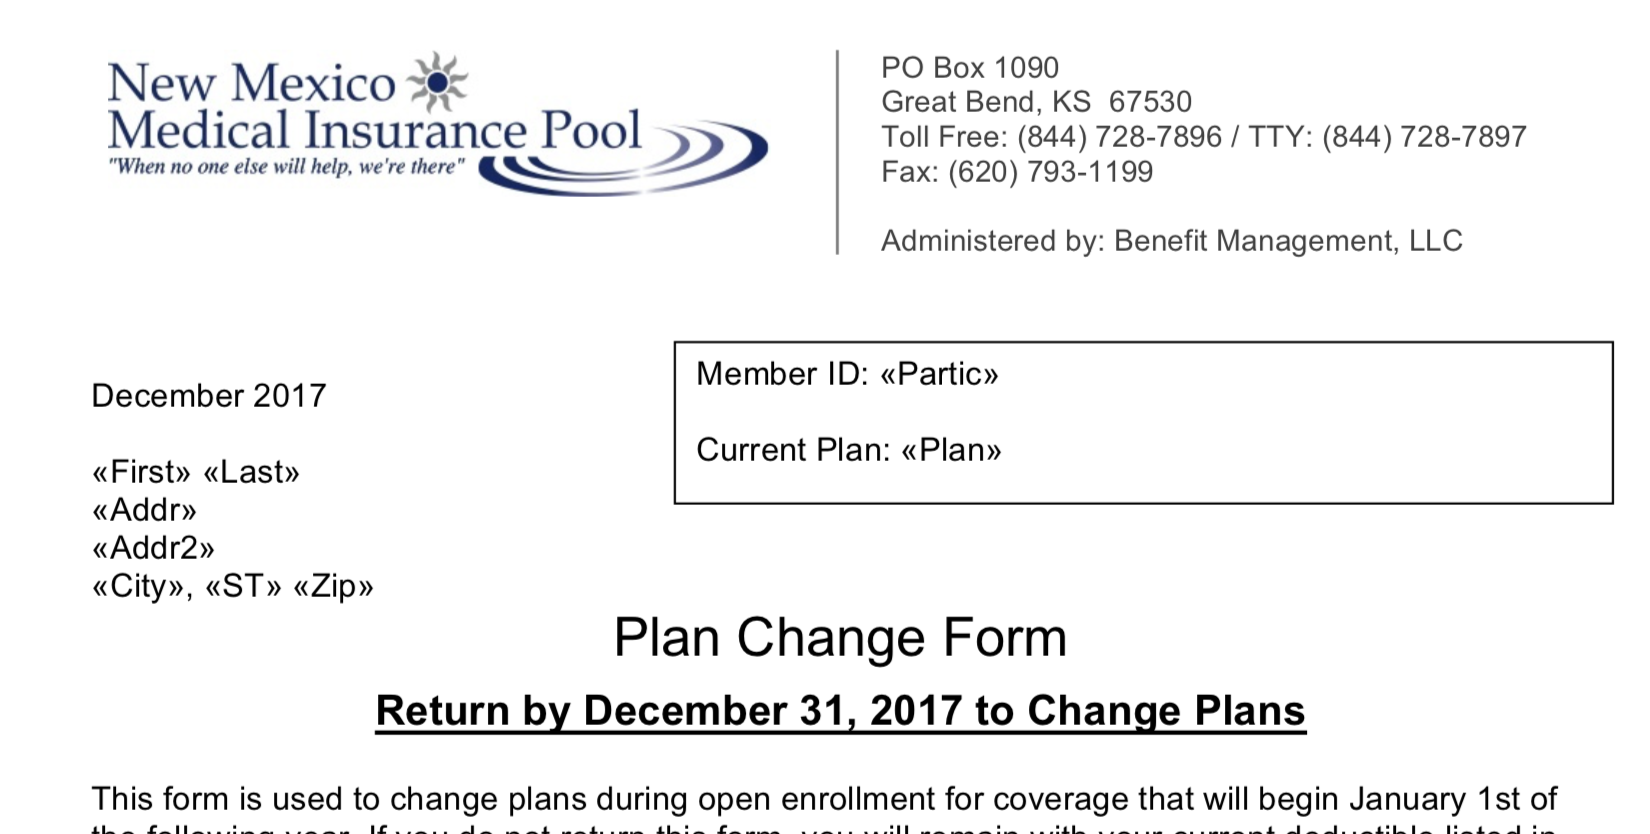 Plan Change Form